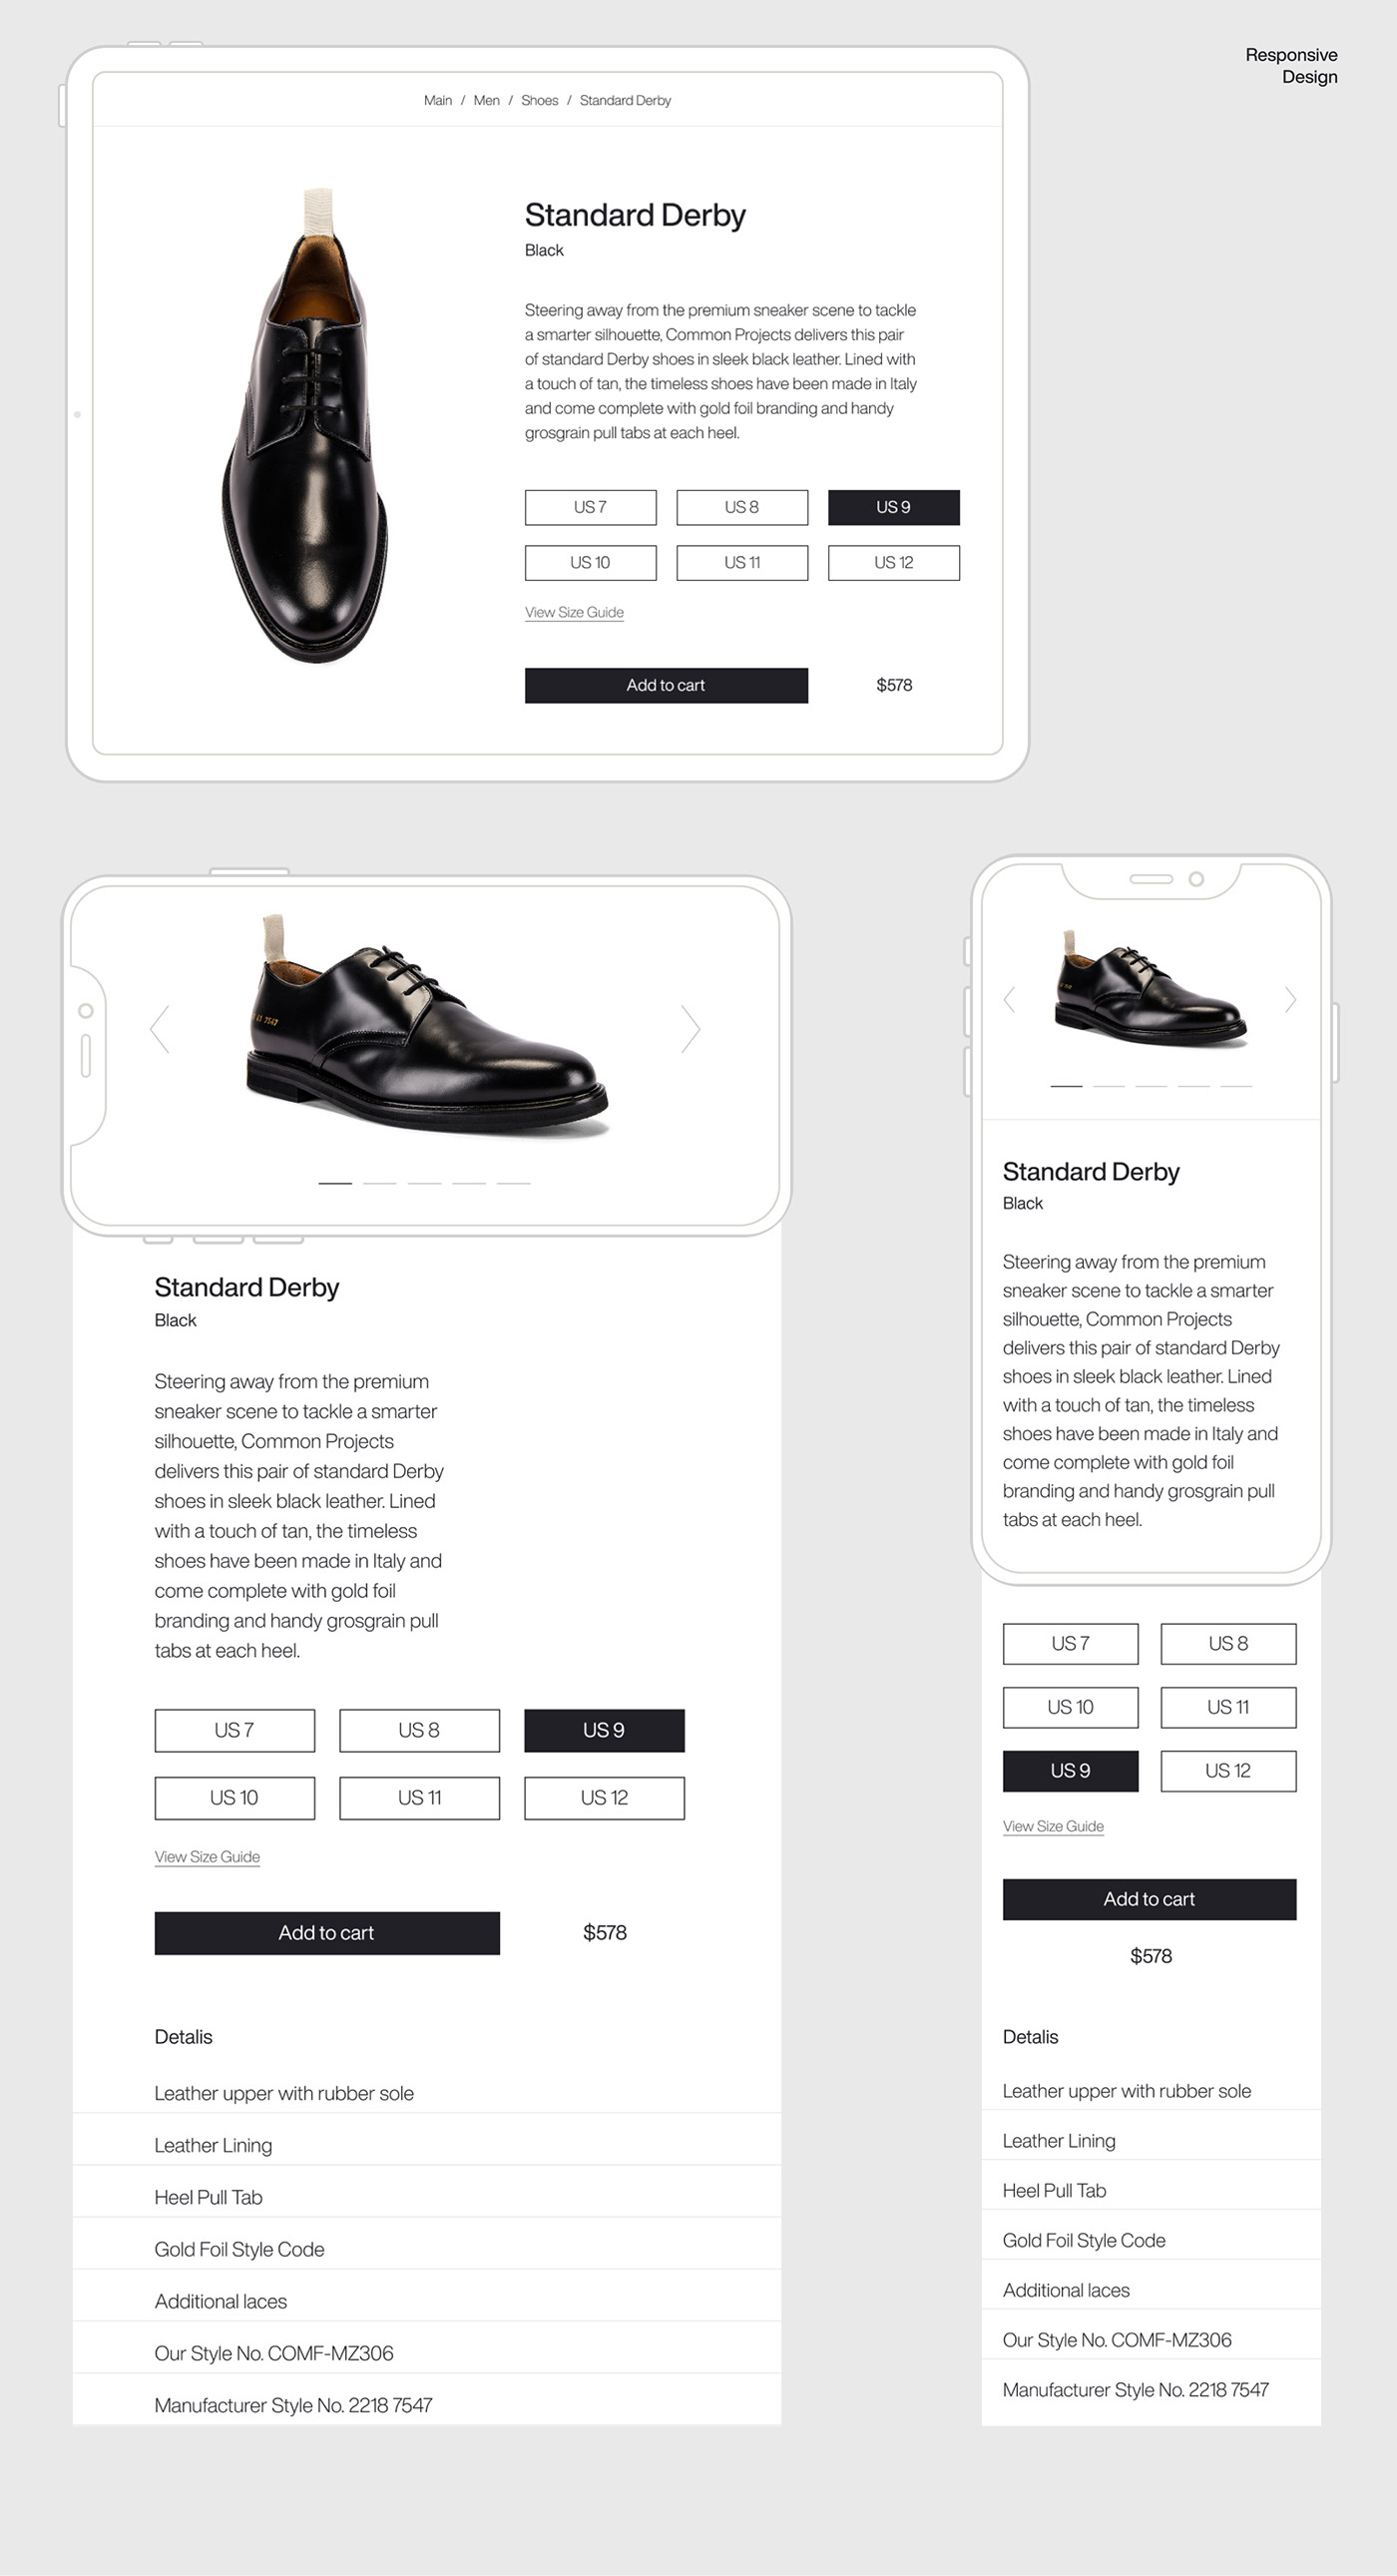 minimal design Minimalism minimalistic online store white design Ecommerce fashion brand fashion website shoe brand footwear brand